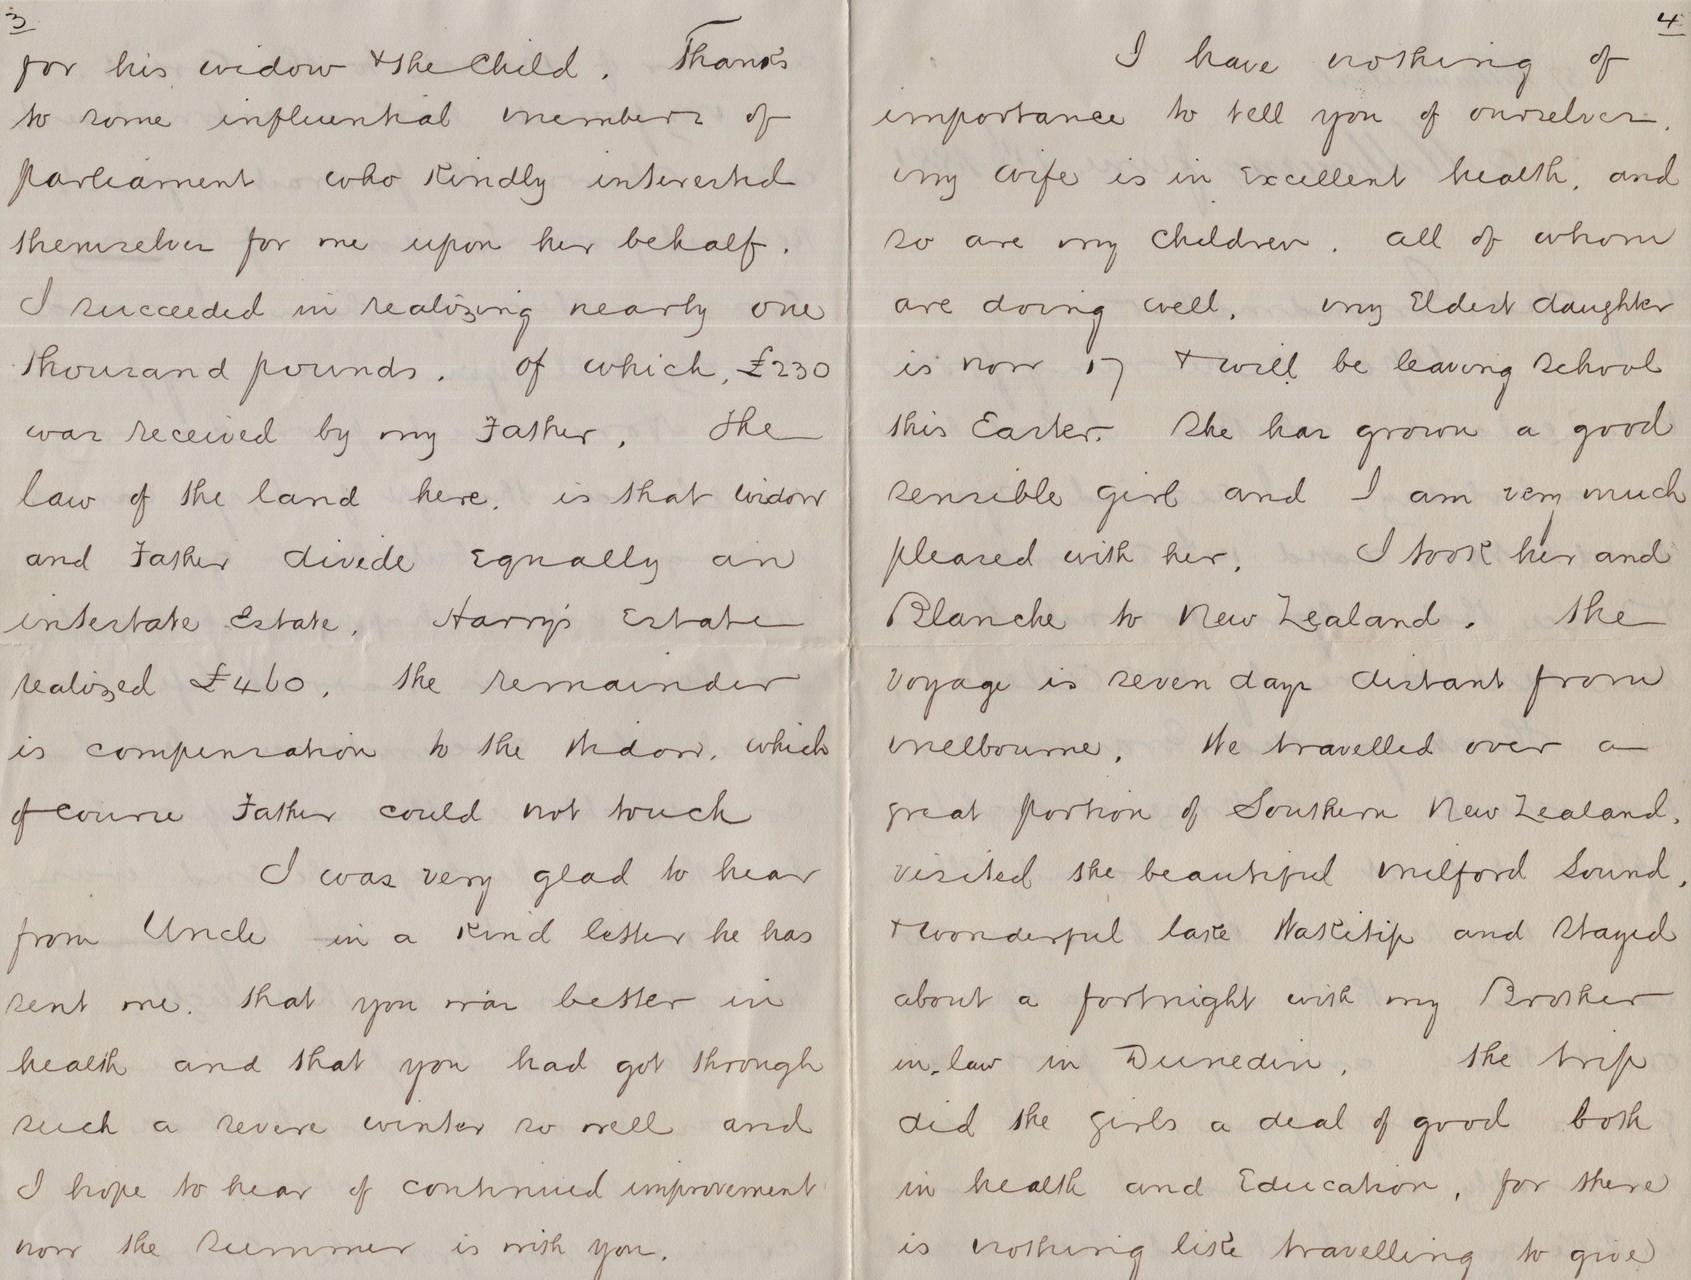 1881 June 11th